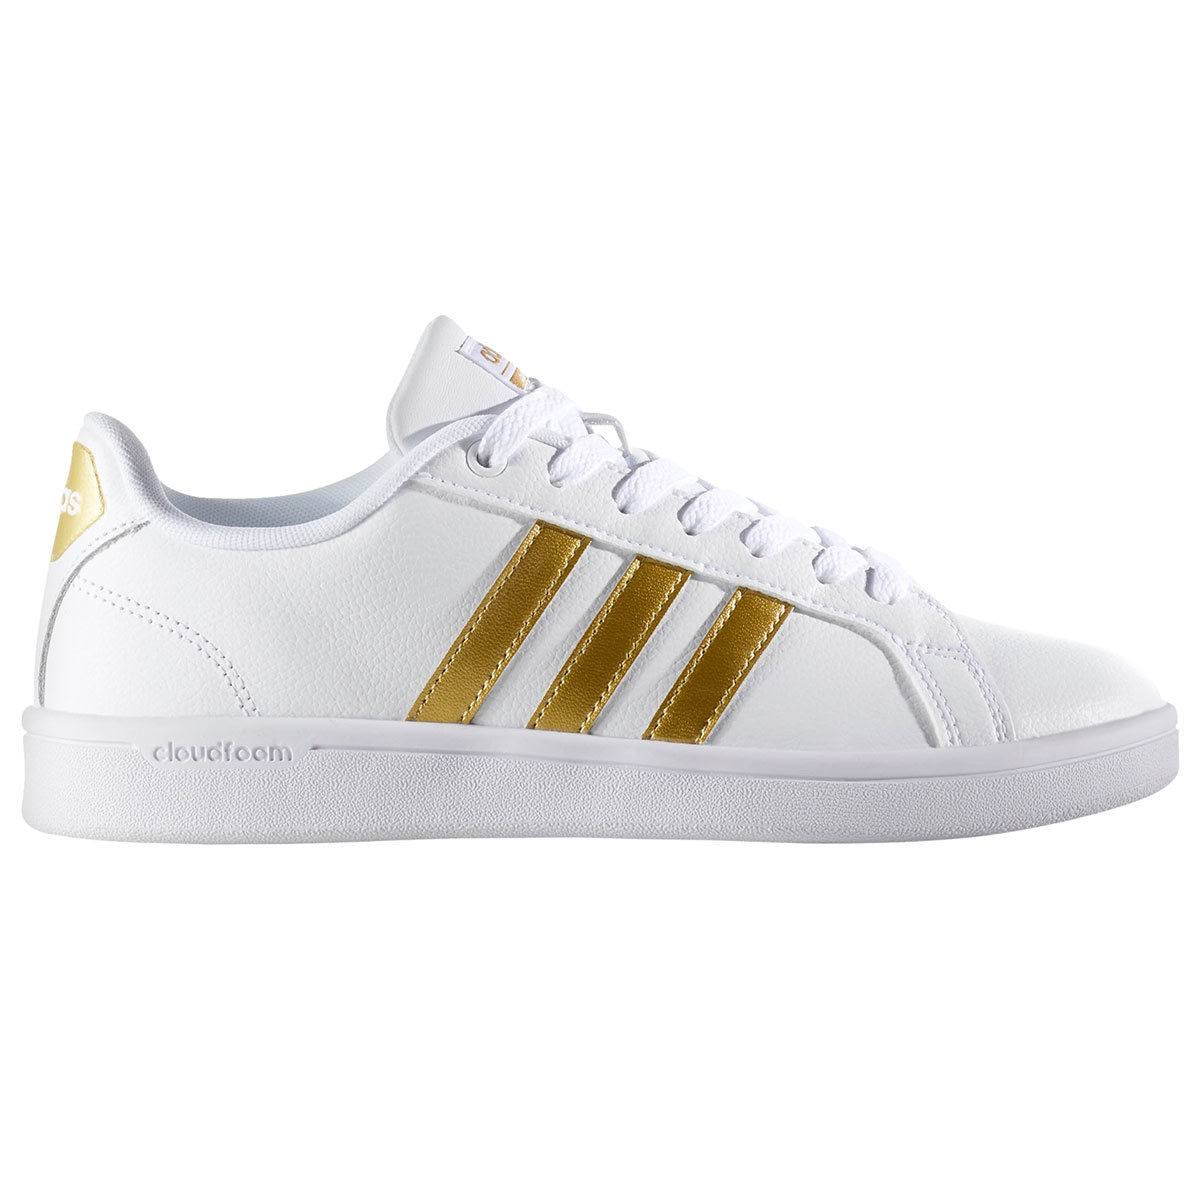 Mujer White 5 Para Cf W 6 Advantage Adidas Originales Zapatos wFPtOW8qx